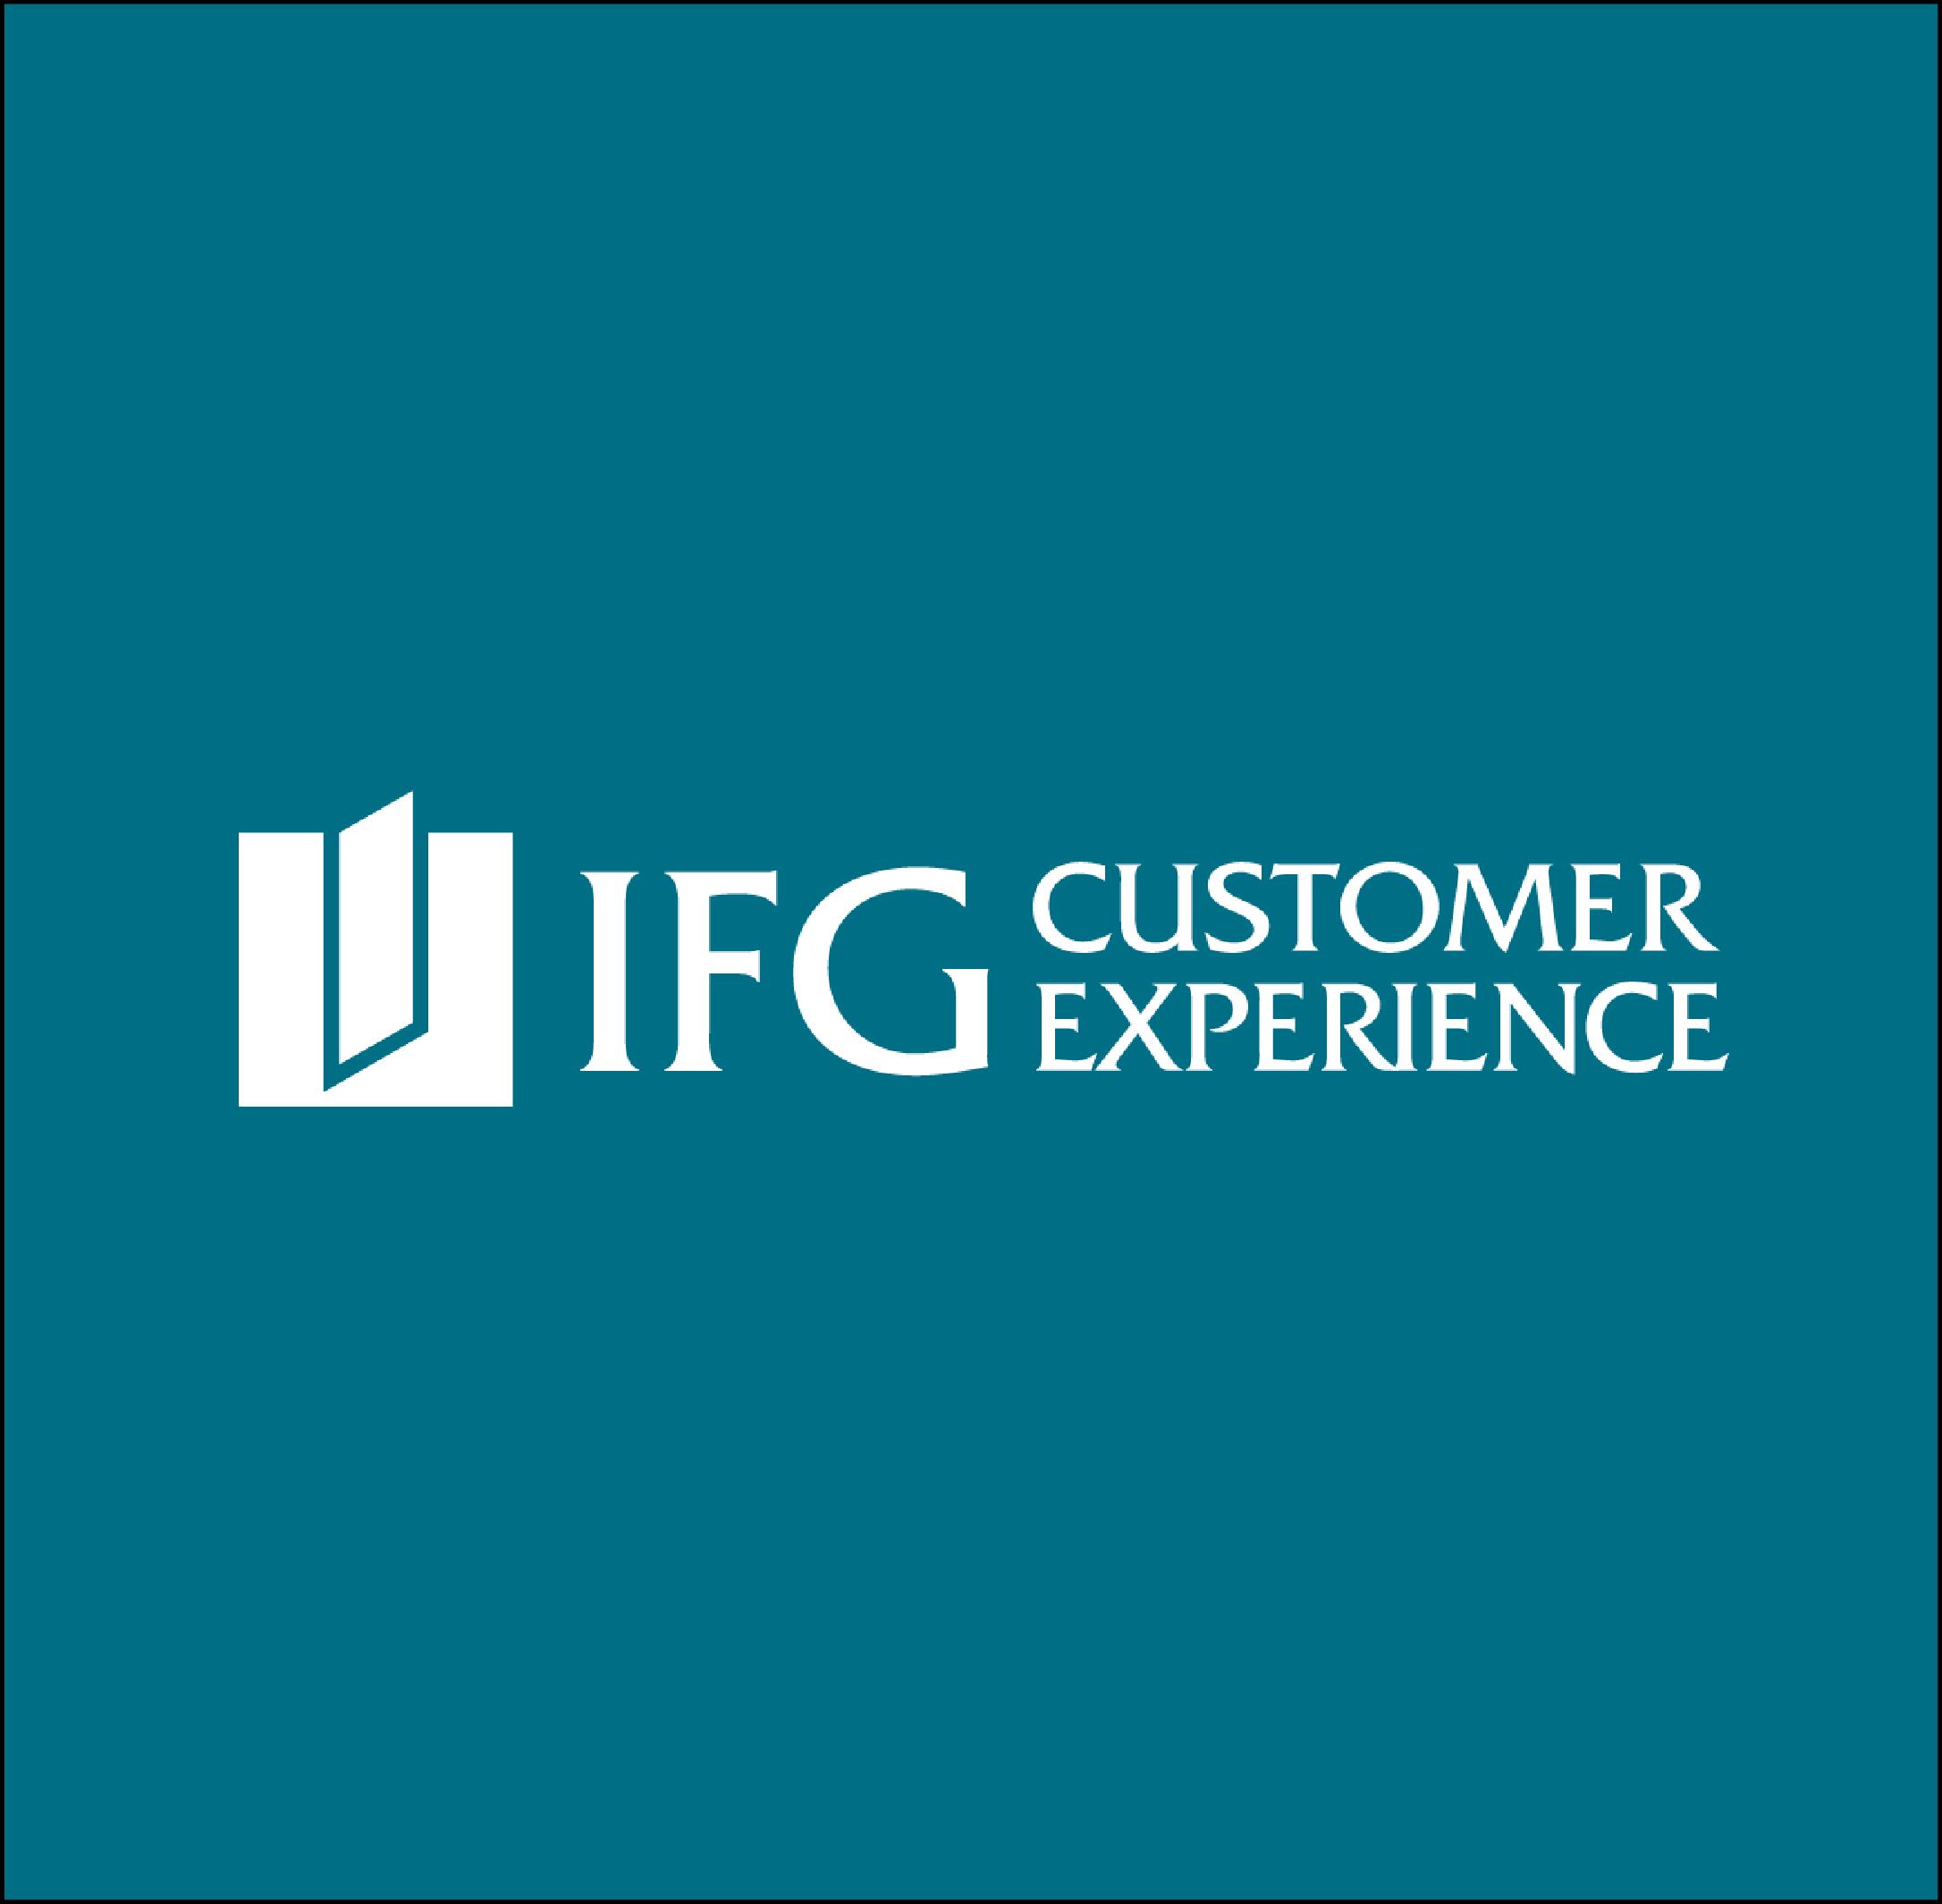 IFG CUSTOMER EXPERIENCE